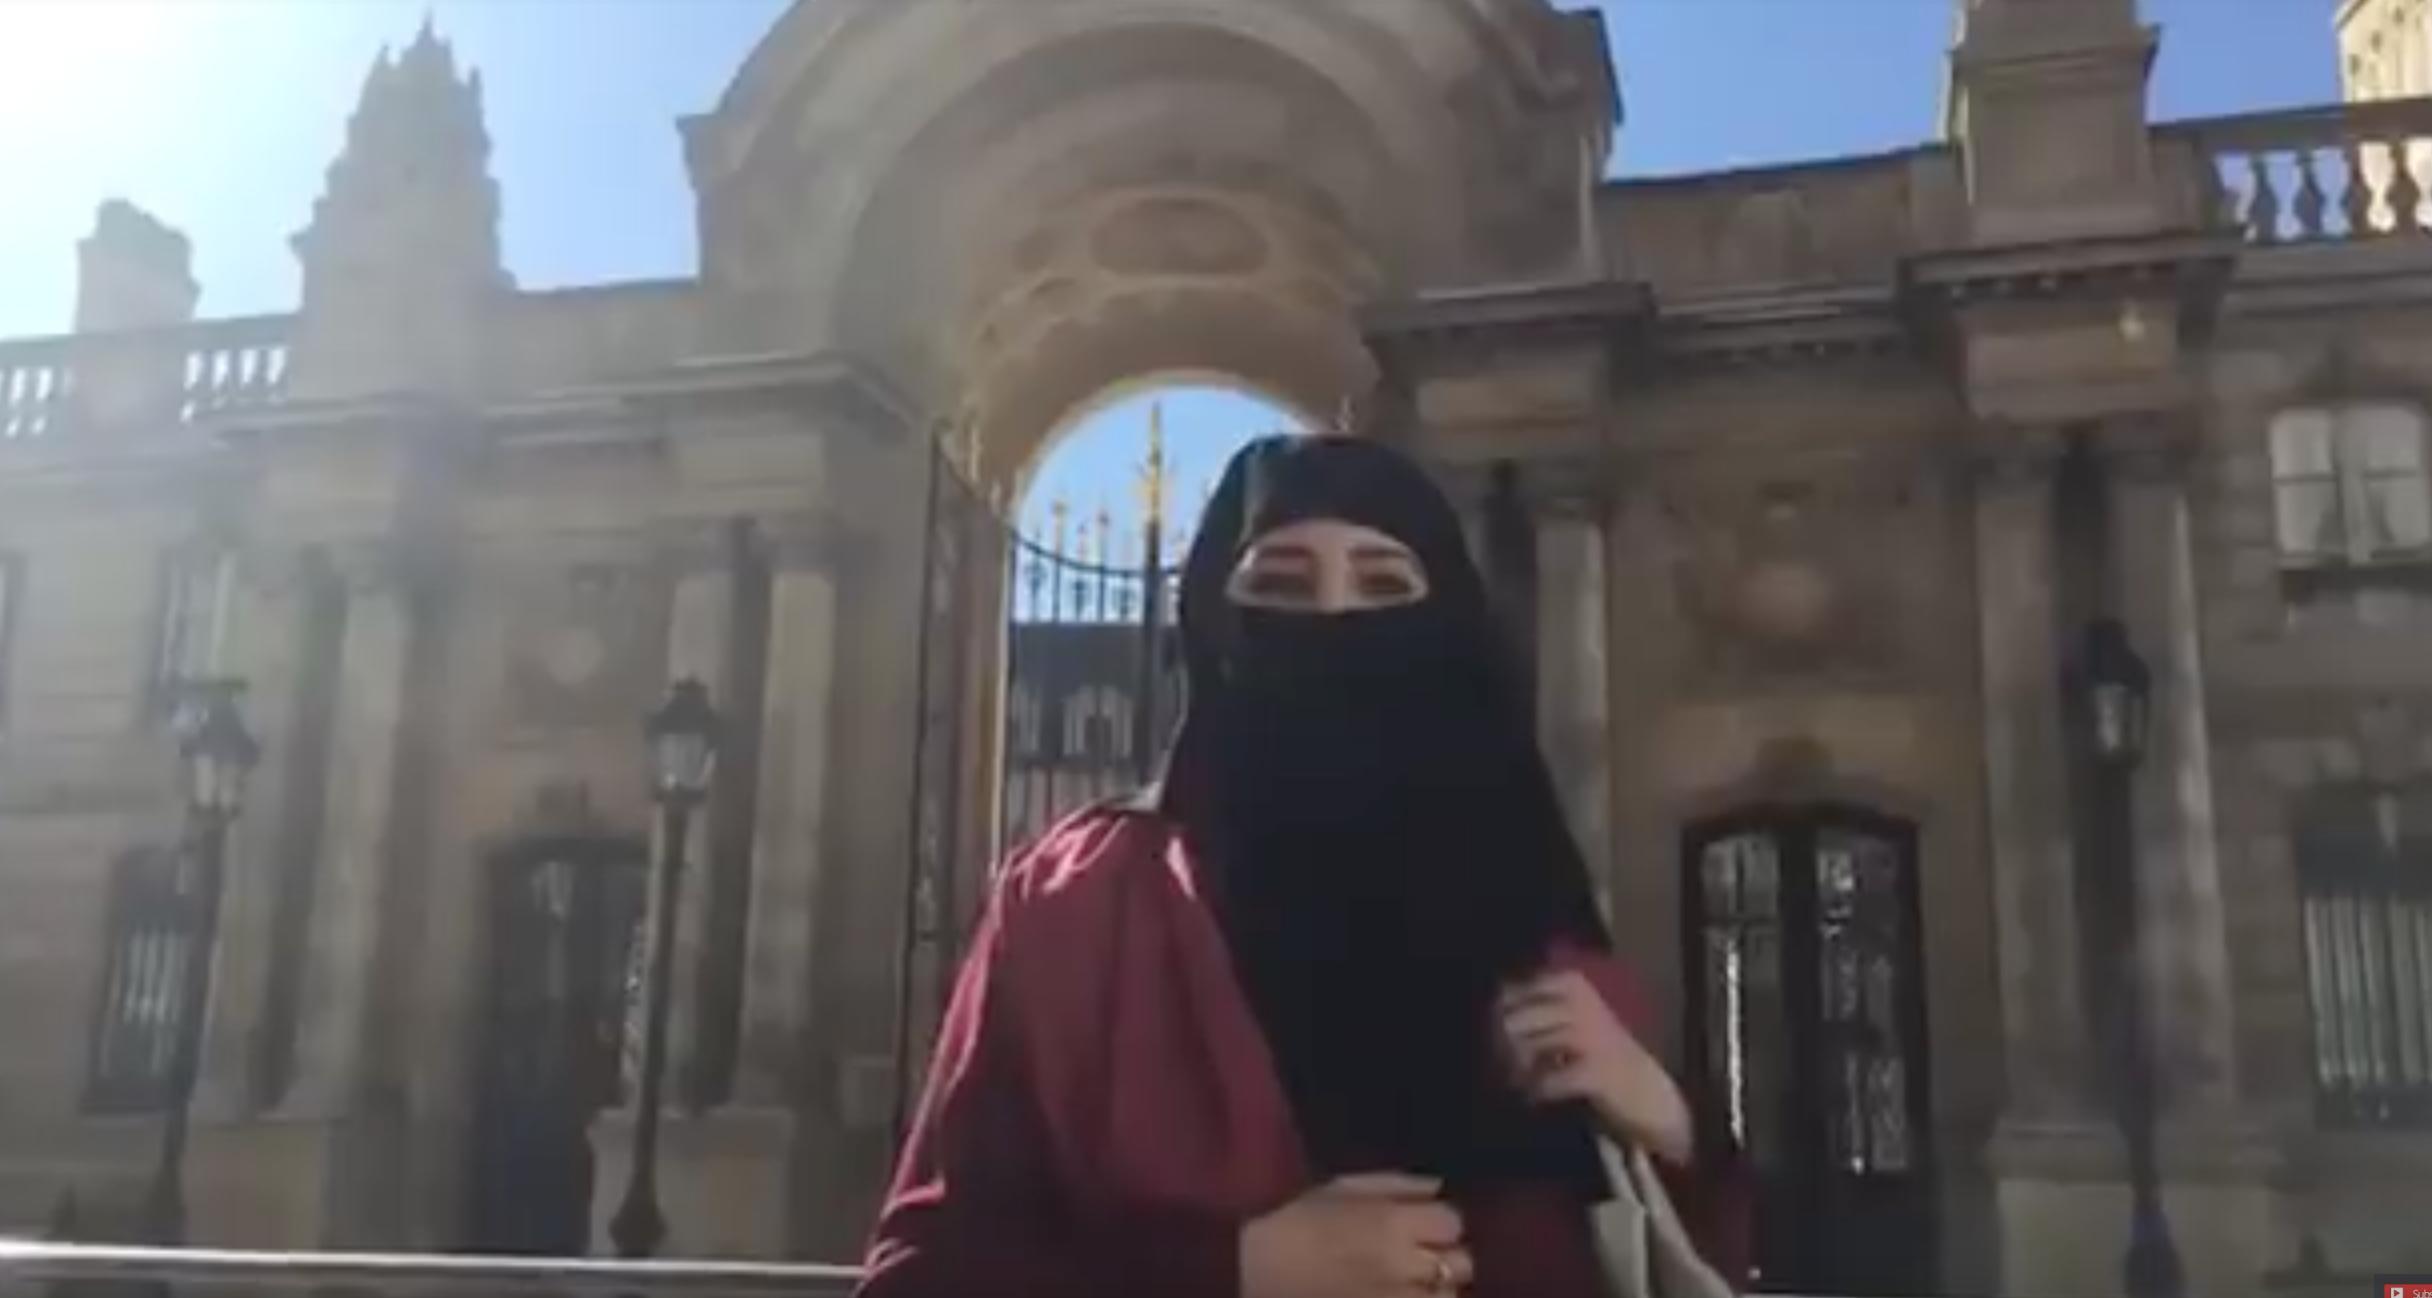 Nekkaz provoque Macron avec une ennikabée devant l'Elysée